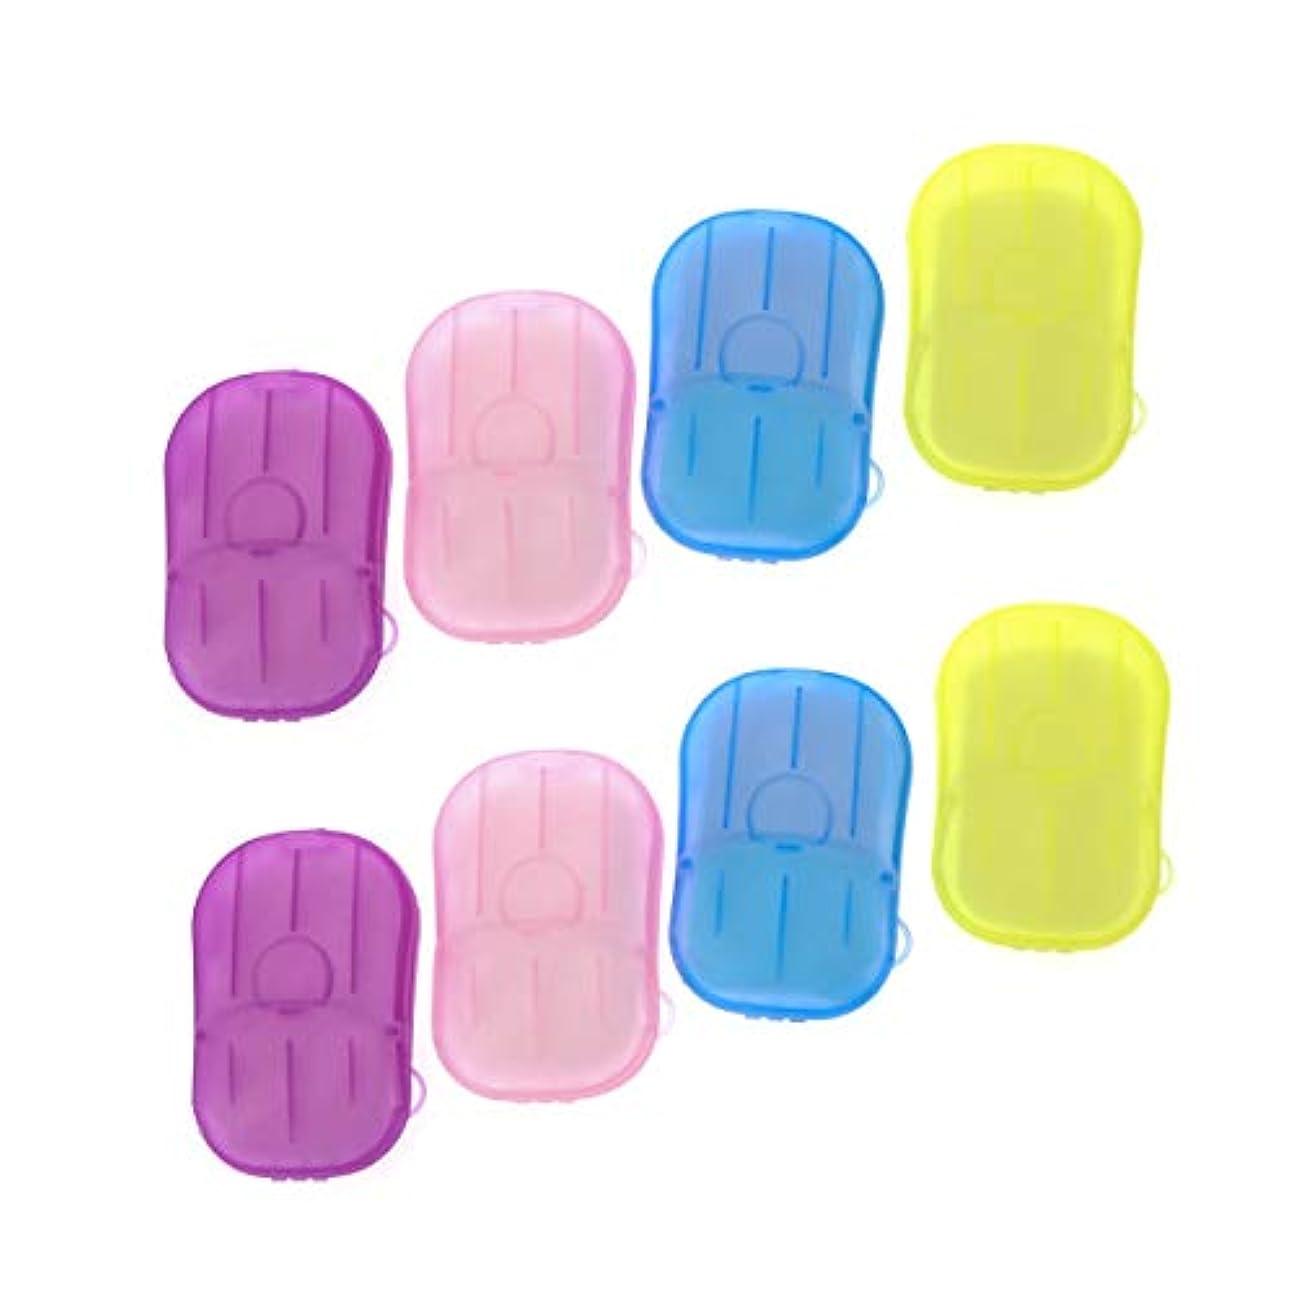 SUPVOX 8ピースポータブルソープペーパー使い捨て手洗いペーパーソープスライスシート用子供大人トイレ旅行屋外